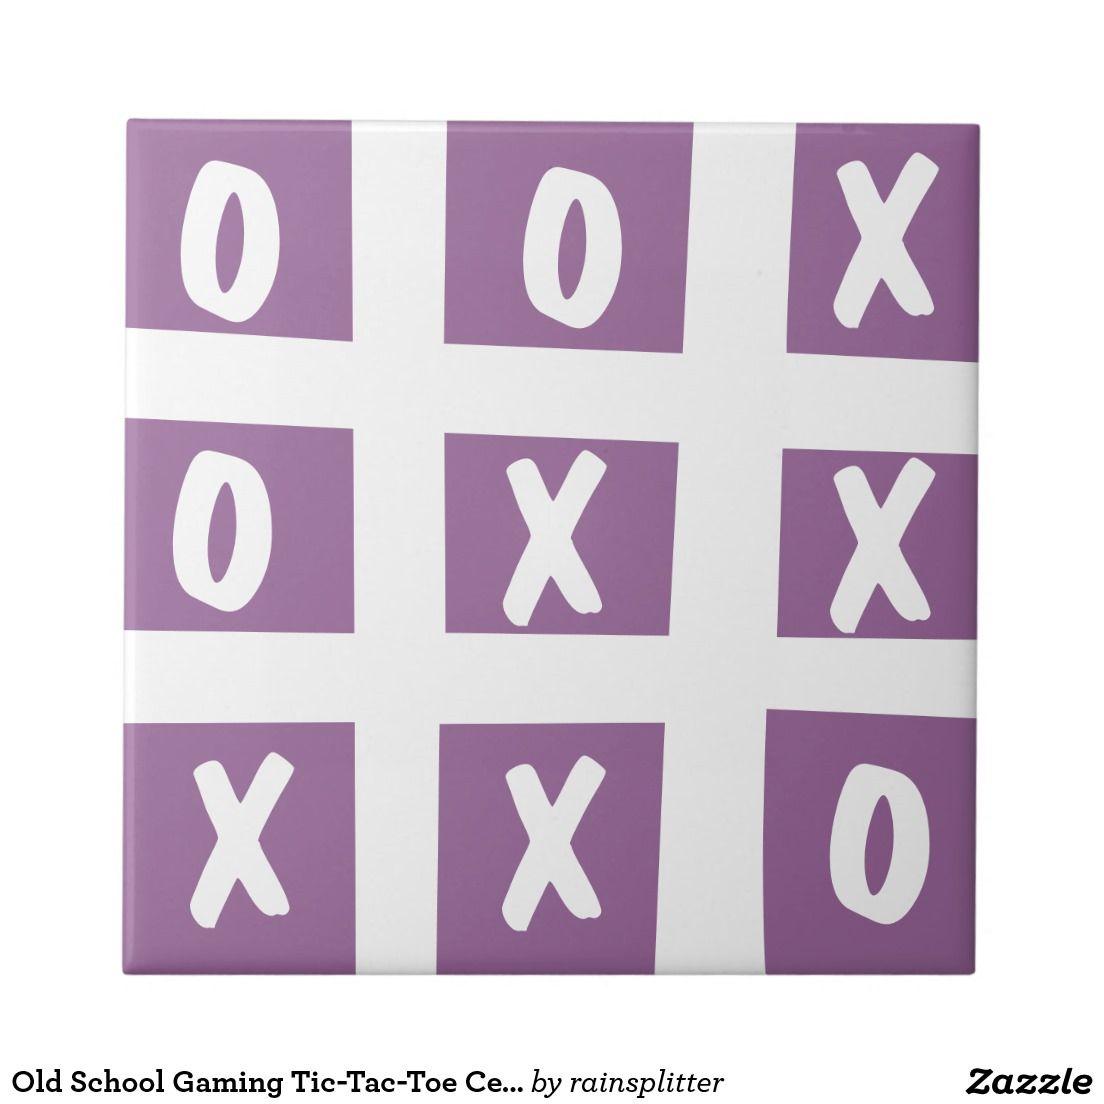 Amazing 1 X 1 Ceiling Tiles Thick 12X12 Ceramic Tiles Regular 13X13 Floor Tile 2 X4 Ceiling Tiles Old 2X4 Drop Ceiling Tiles Green2X6 Subway Tile Old School Gaming Tic Tac Toe Ceramic Tile   Tile: Bath 3 Accent ..